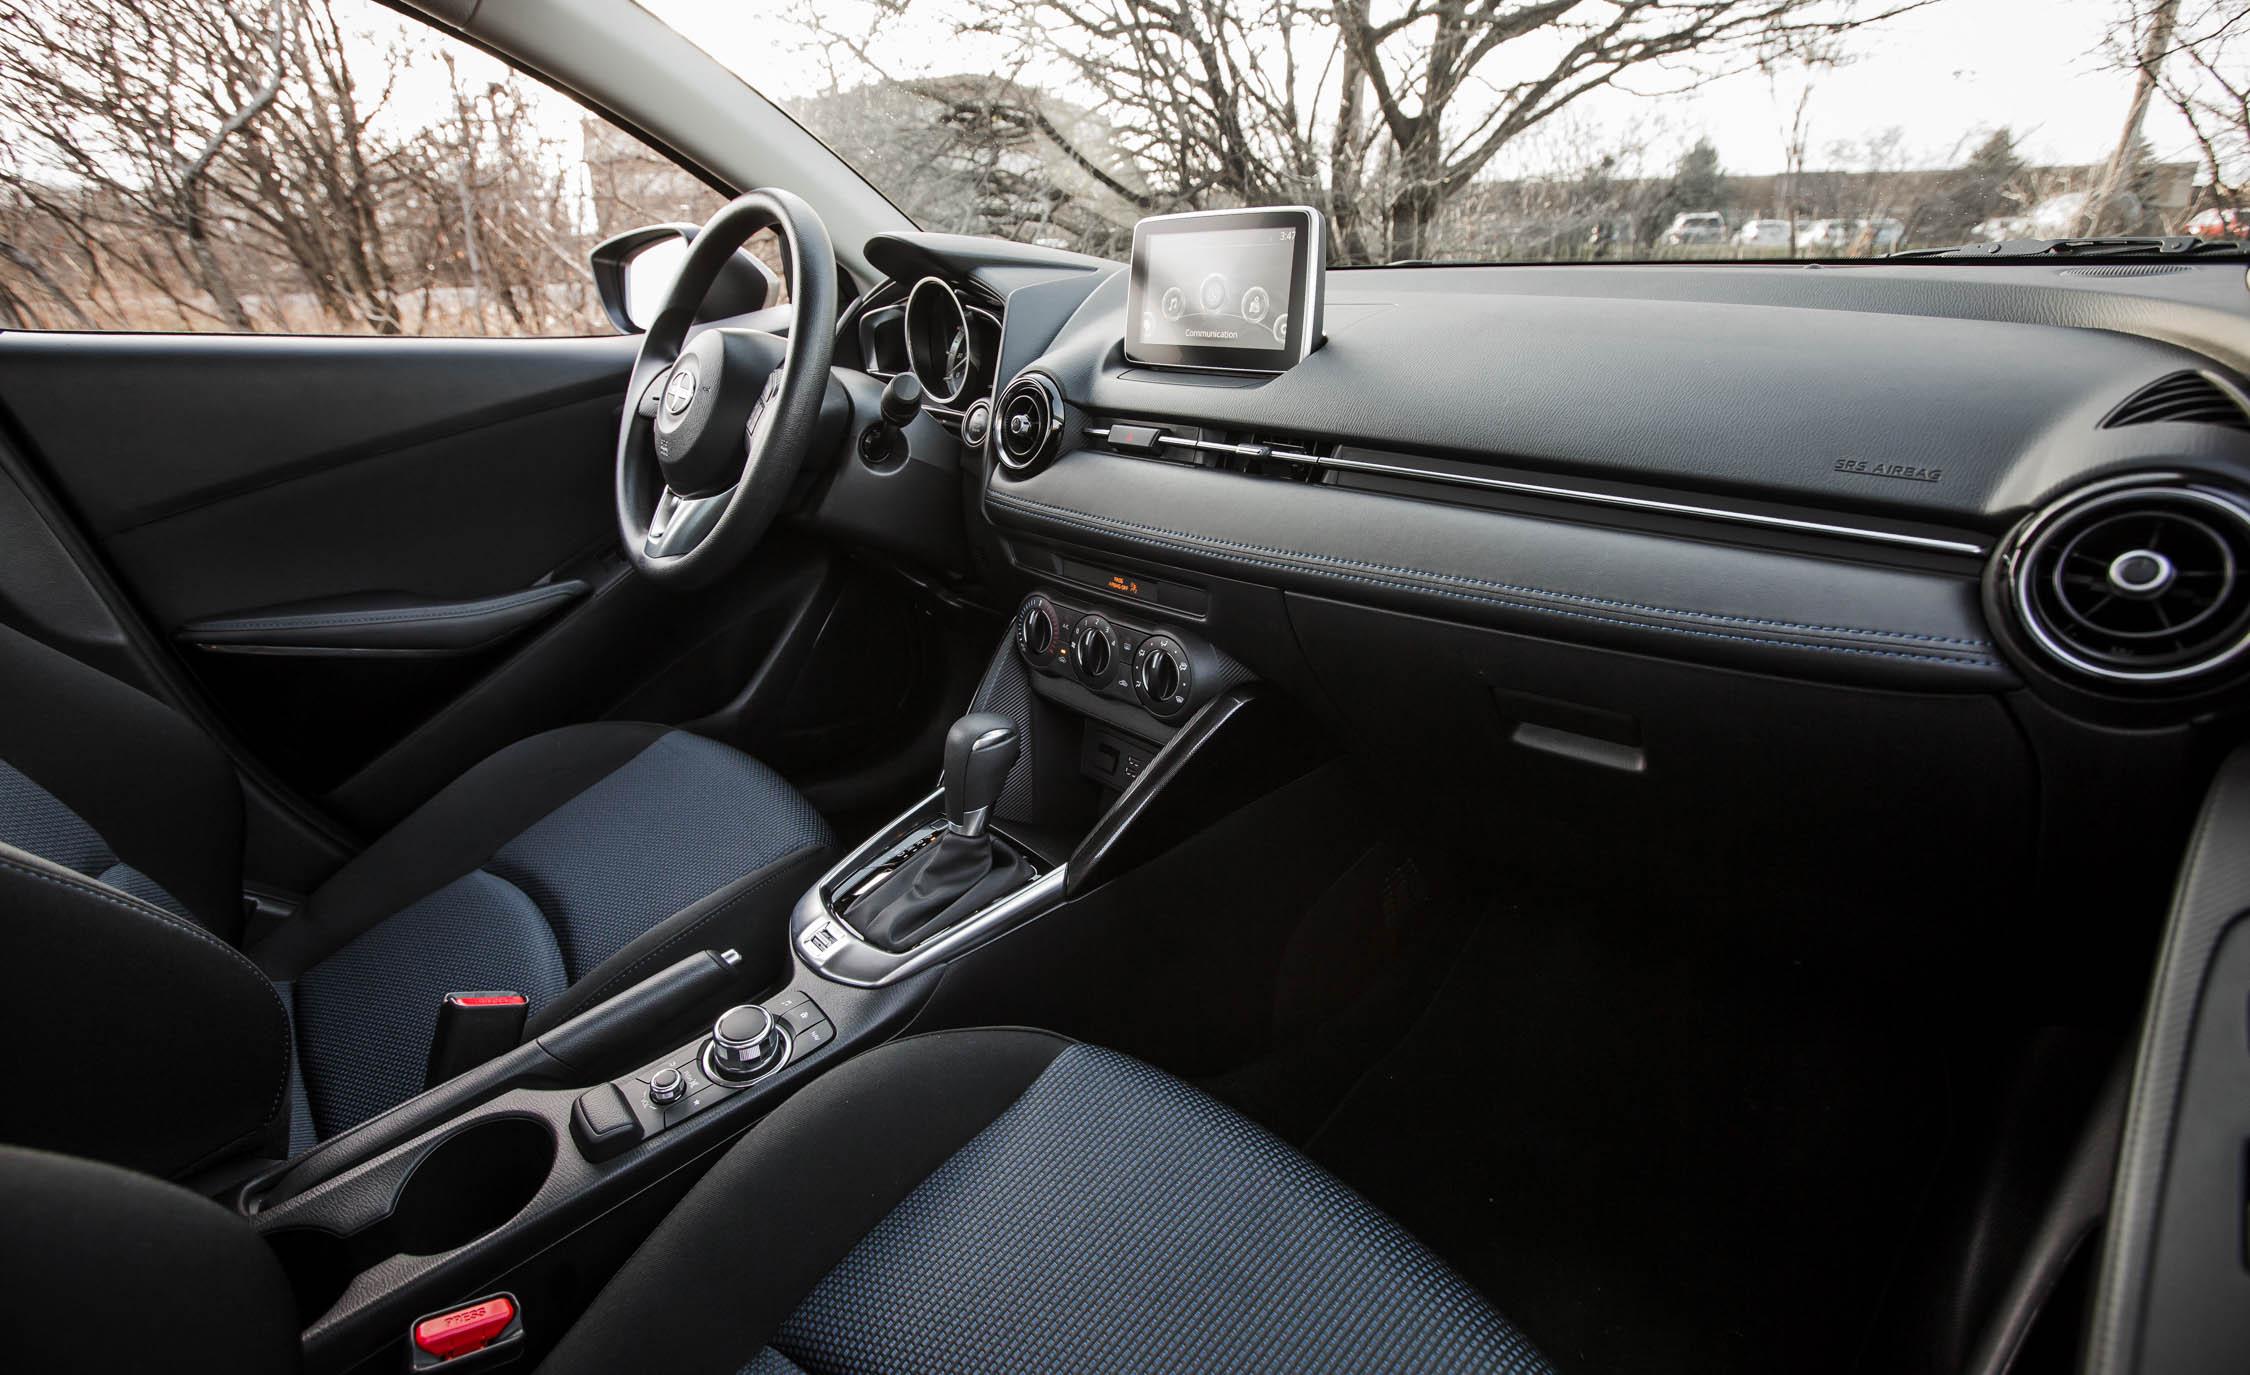 2016 Scion iA Interior Dashboard